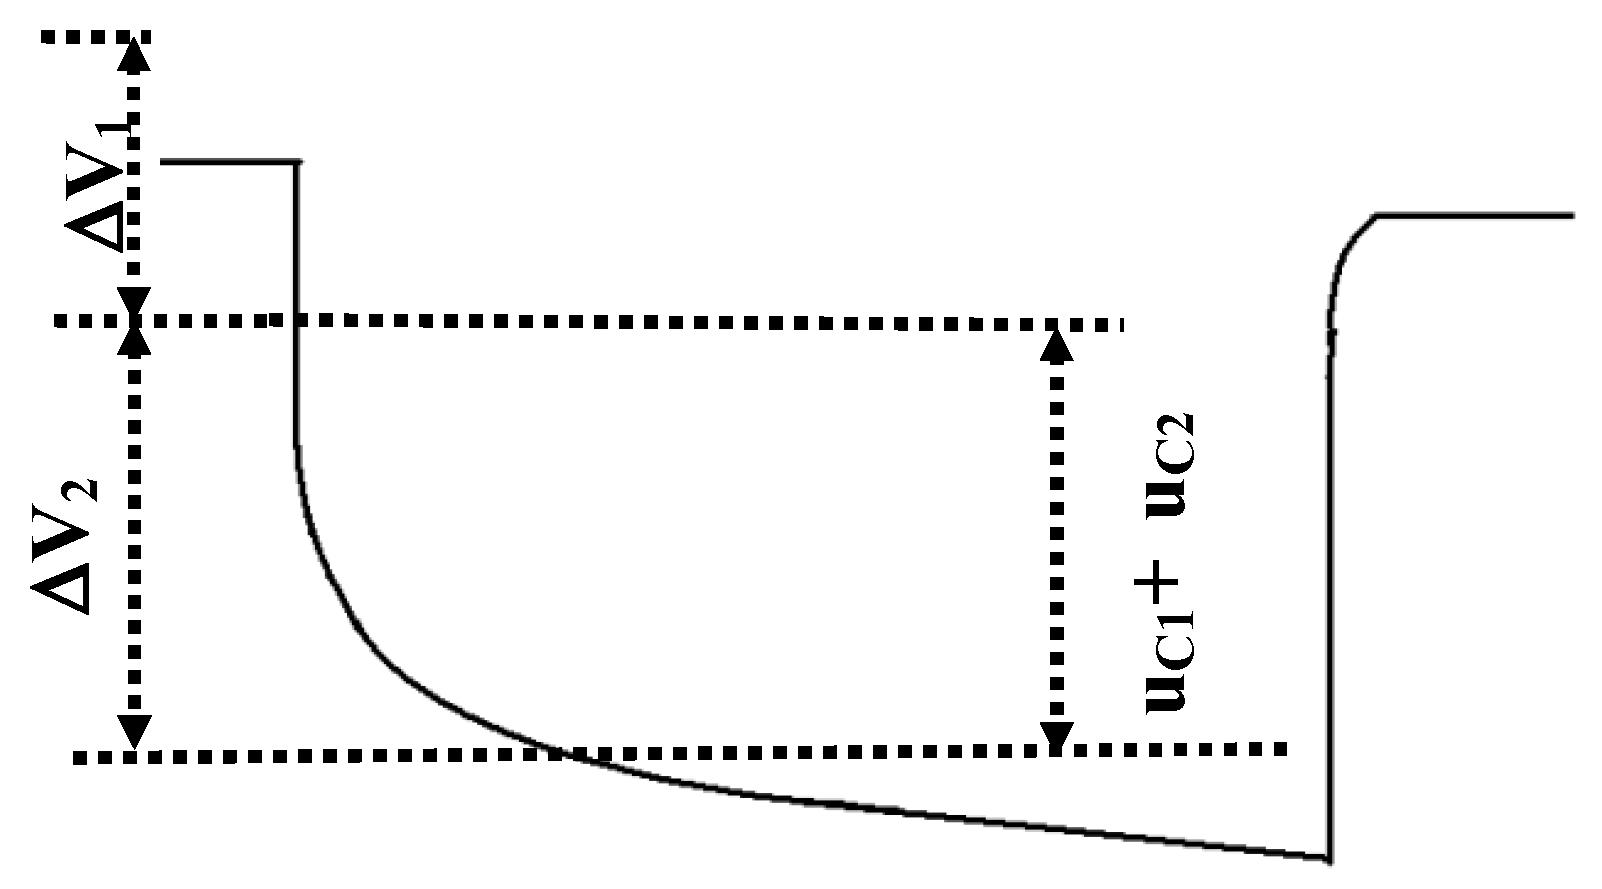 xiaomi scooter wiring diagram